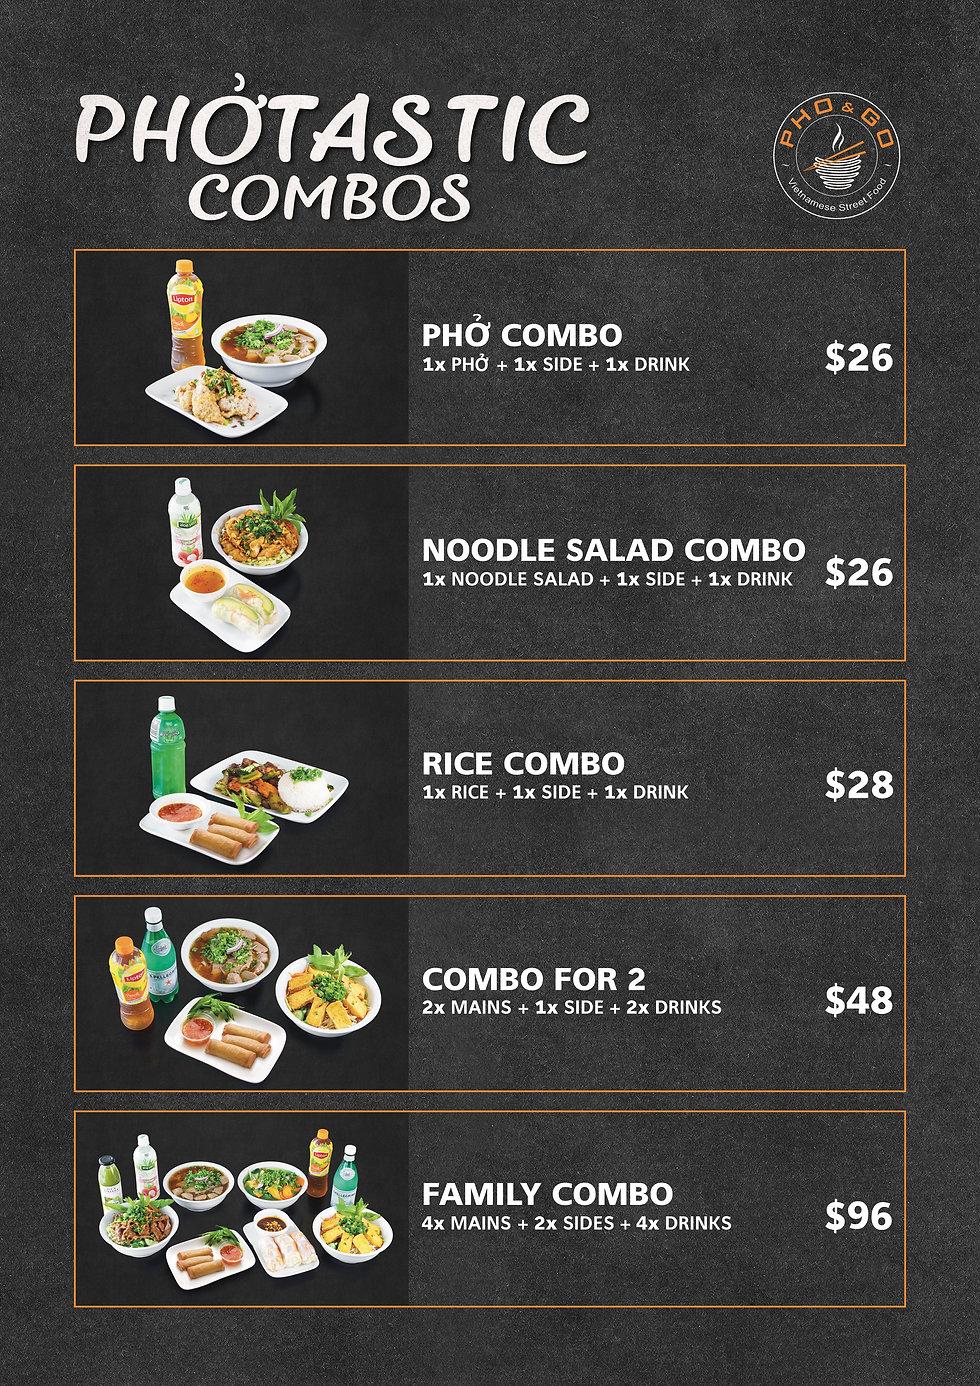 PHOTASTIC COMBOS price change copy.jpg